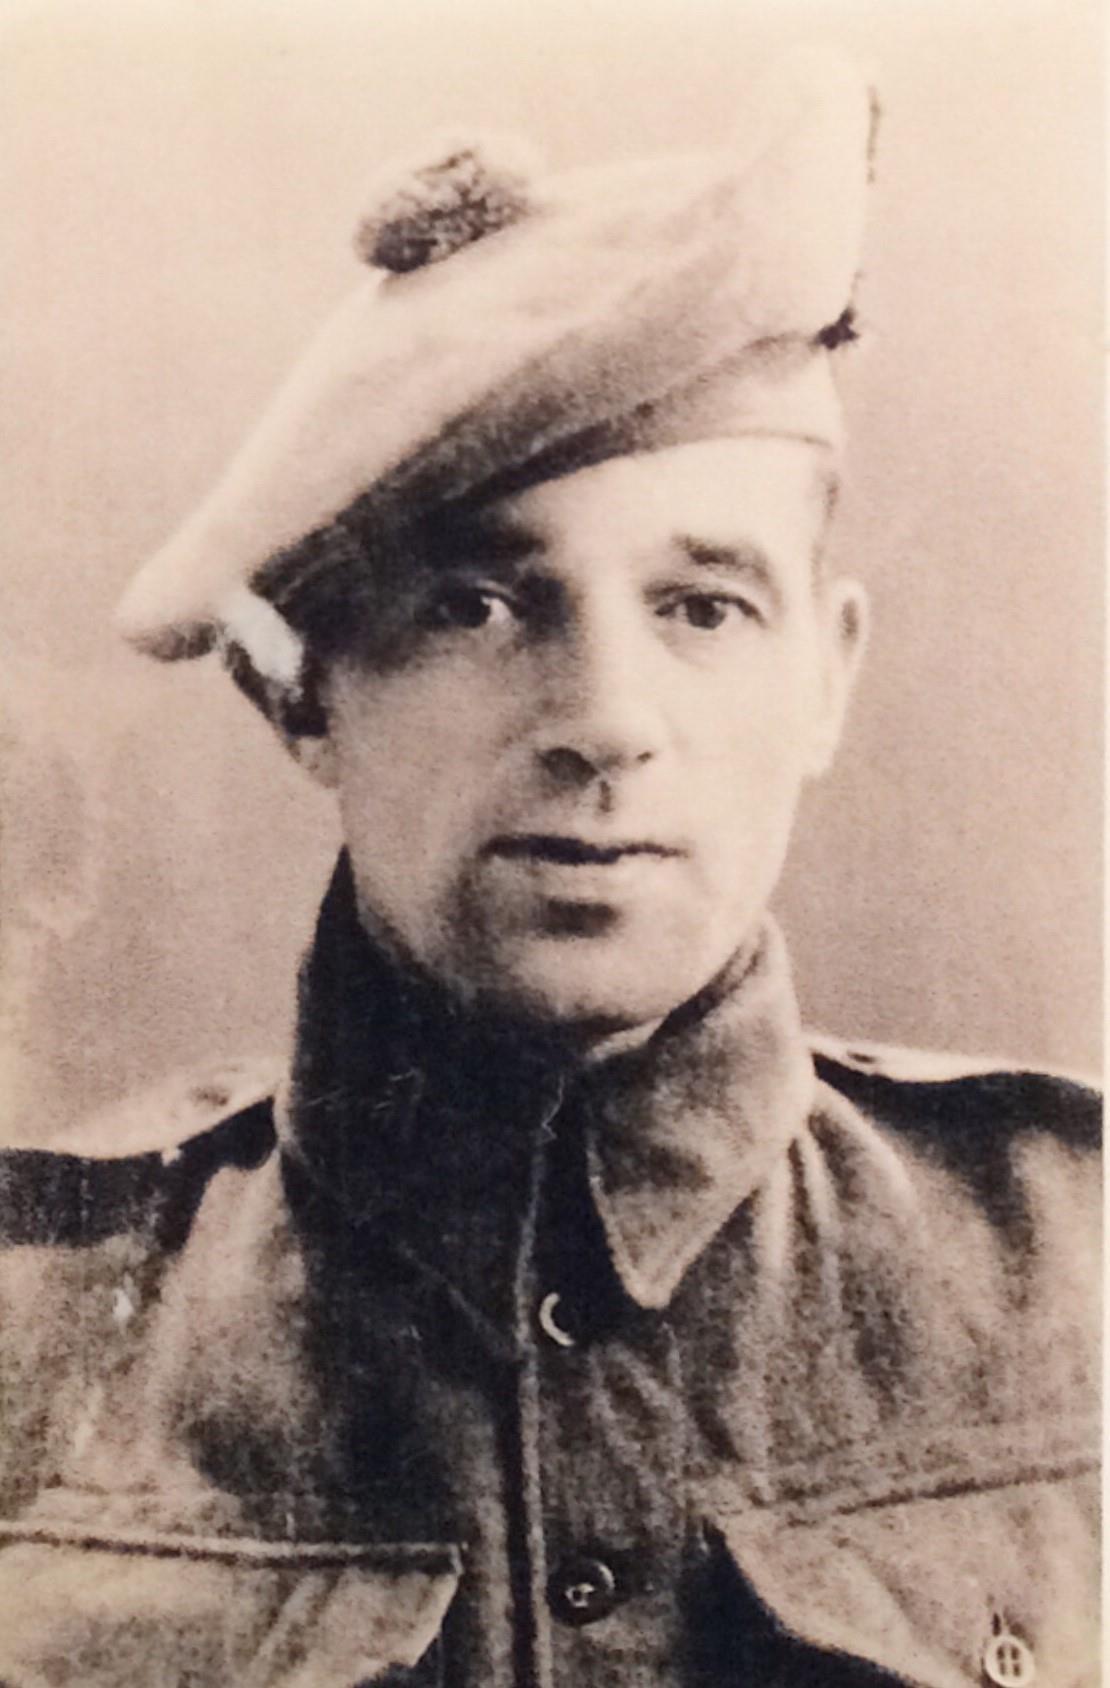 Private David McKellar